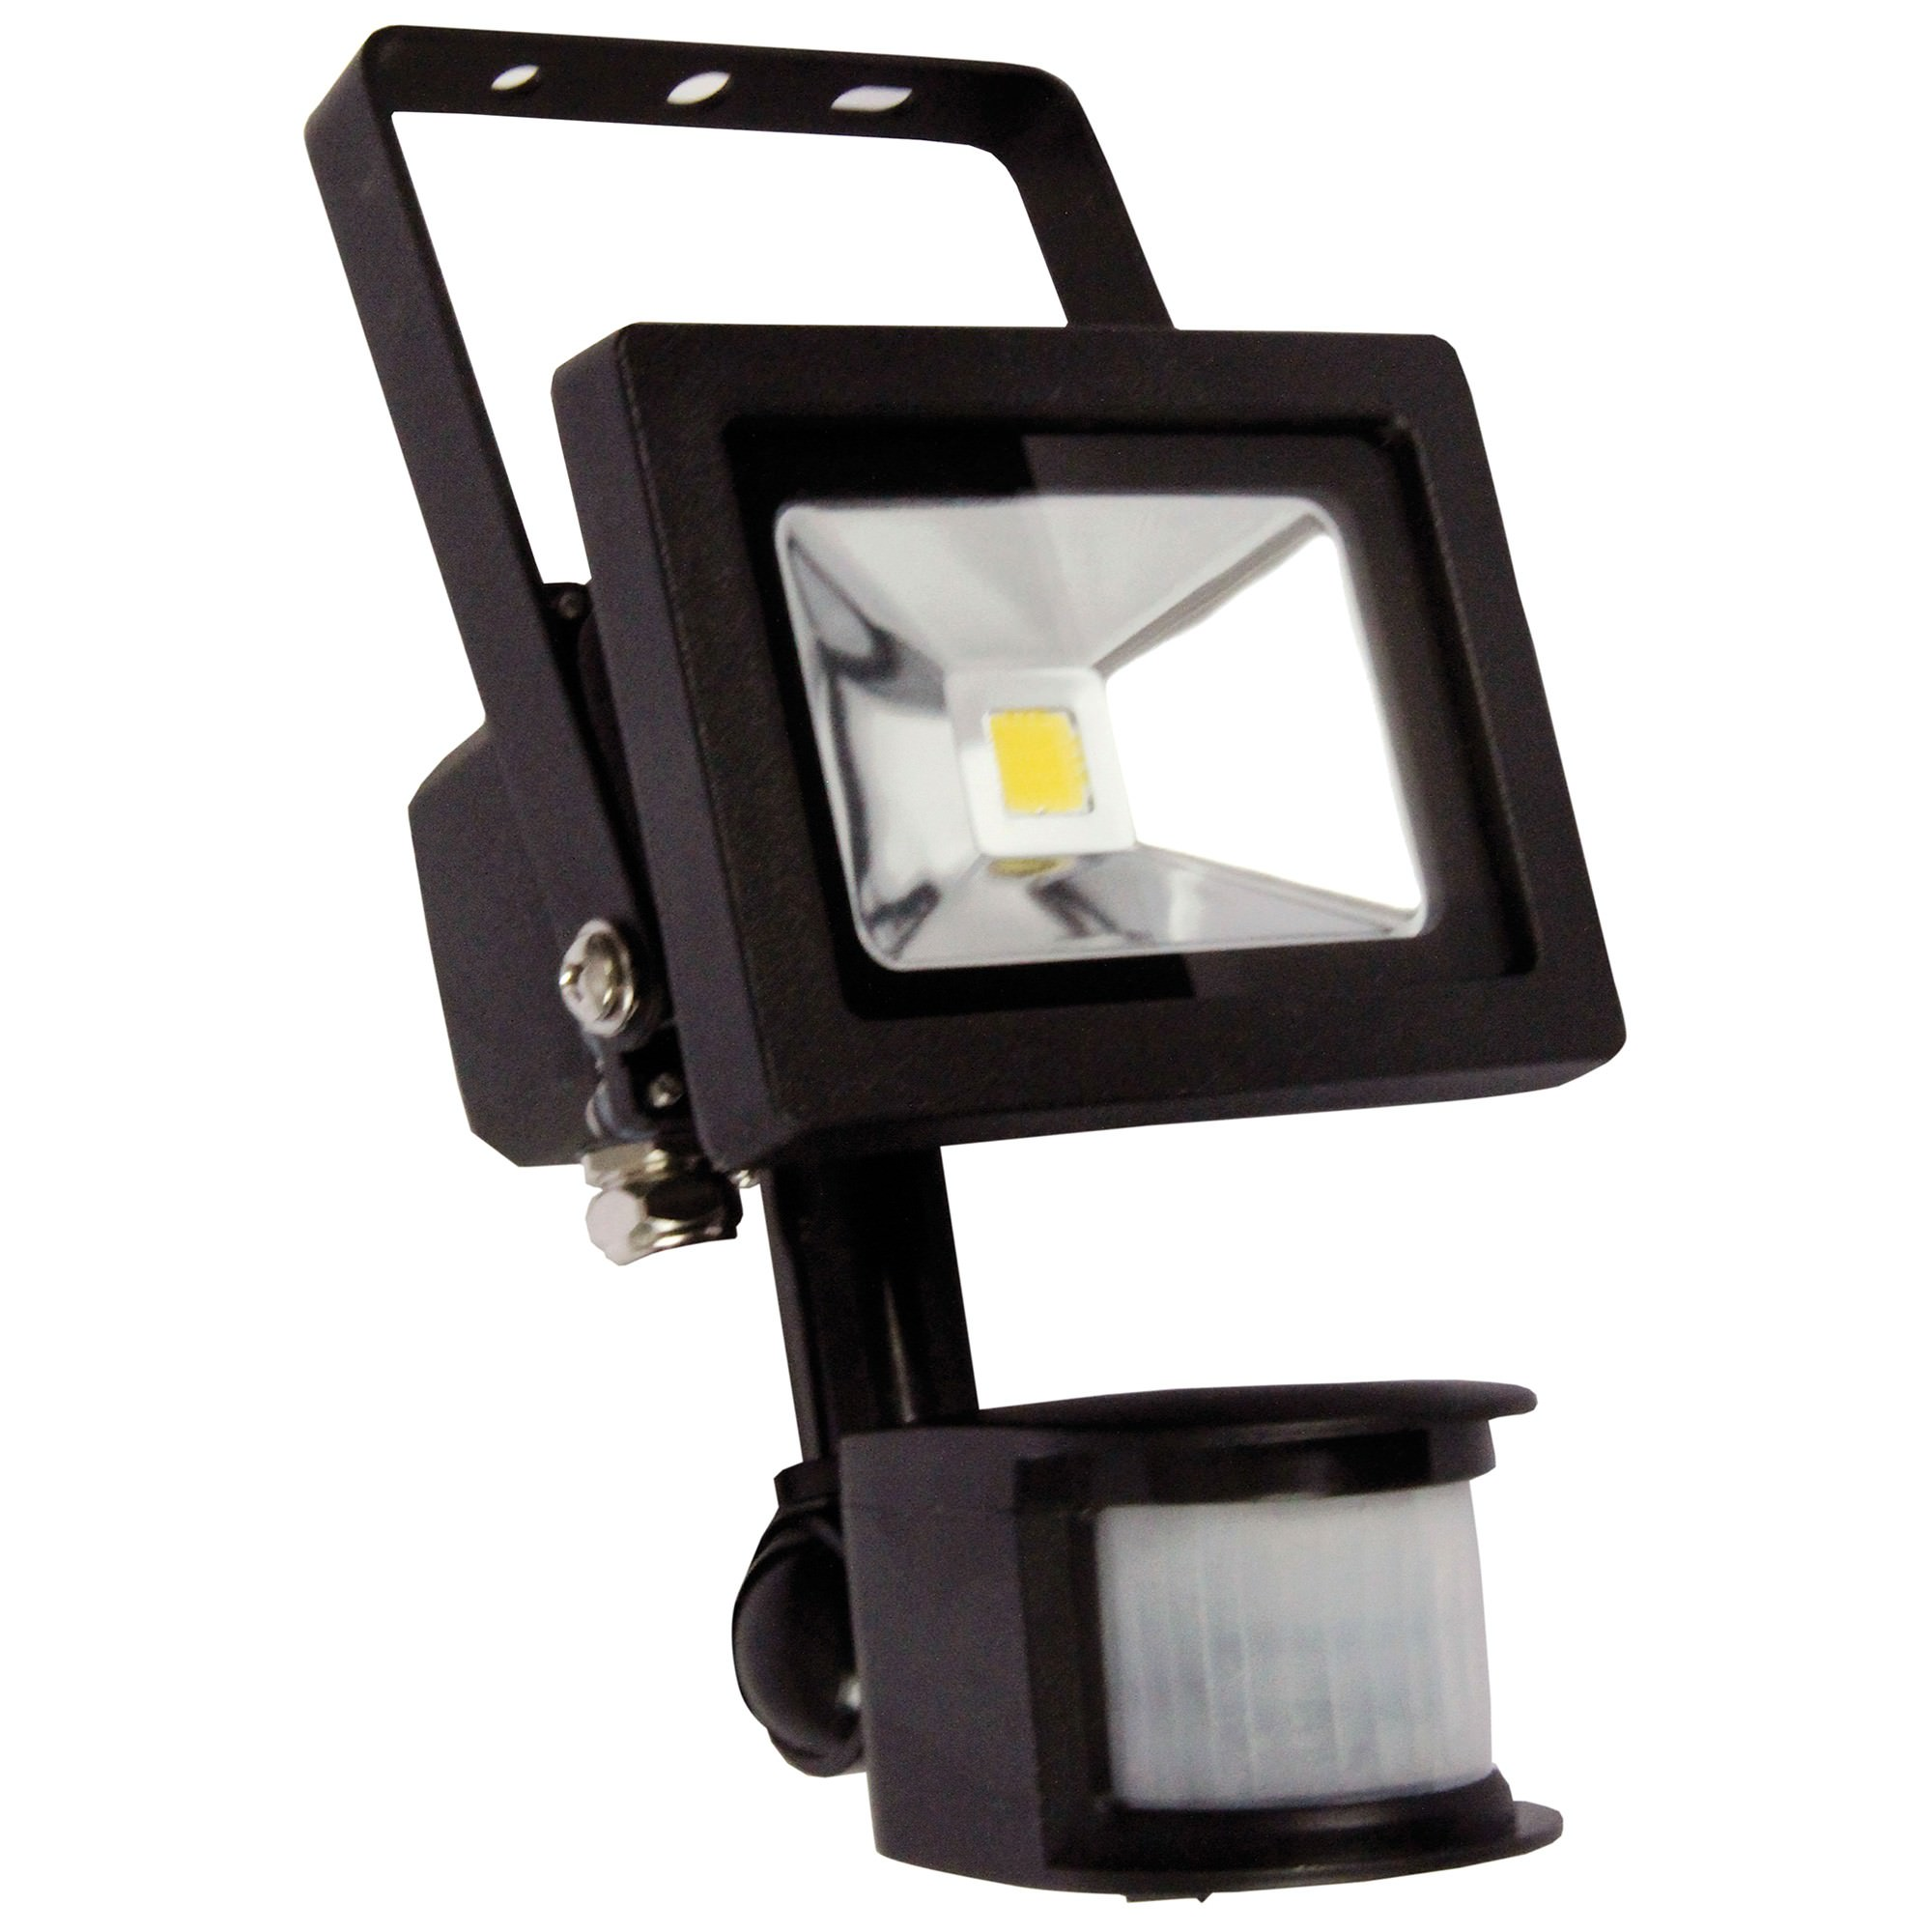 Foco IP44 LED Floodlight with Sensor, 10W, Black